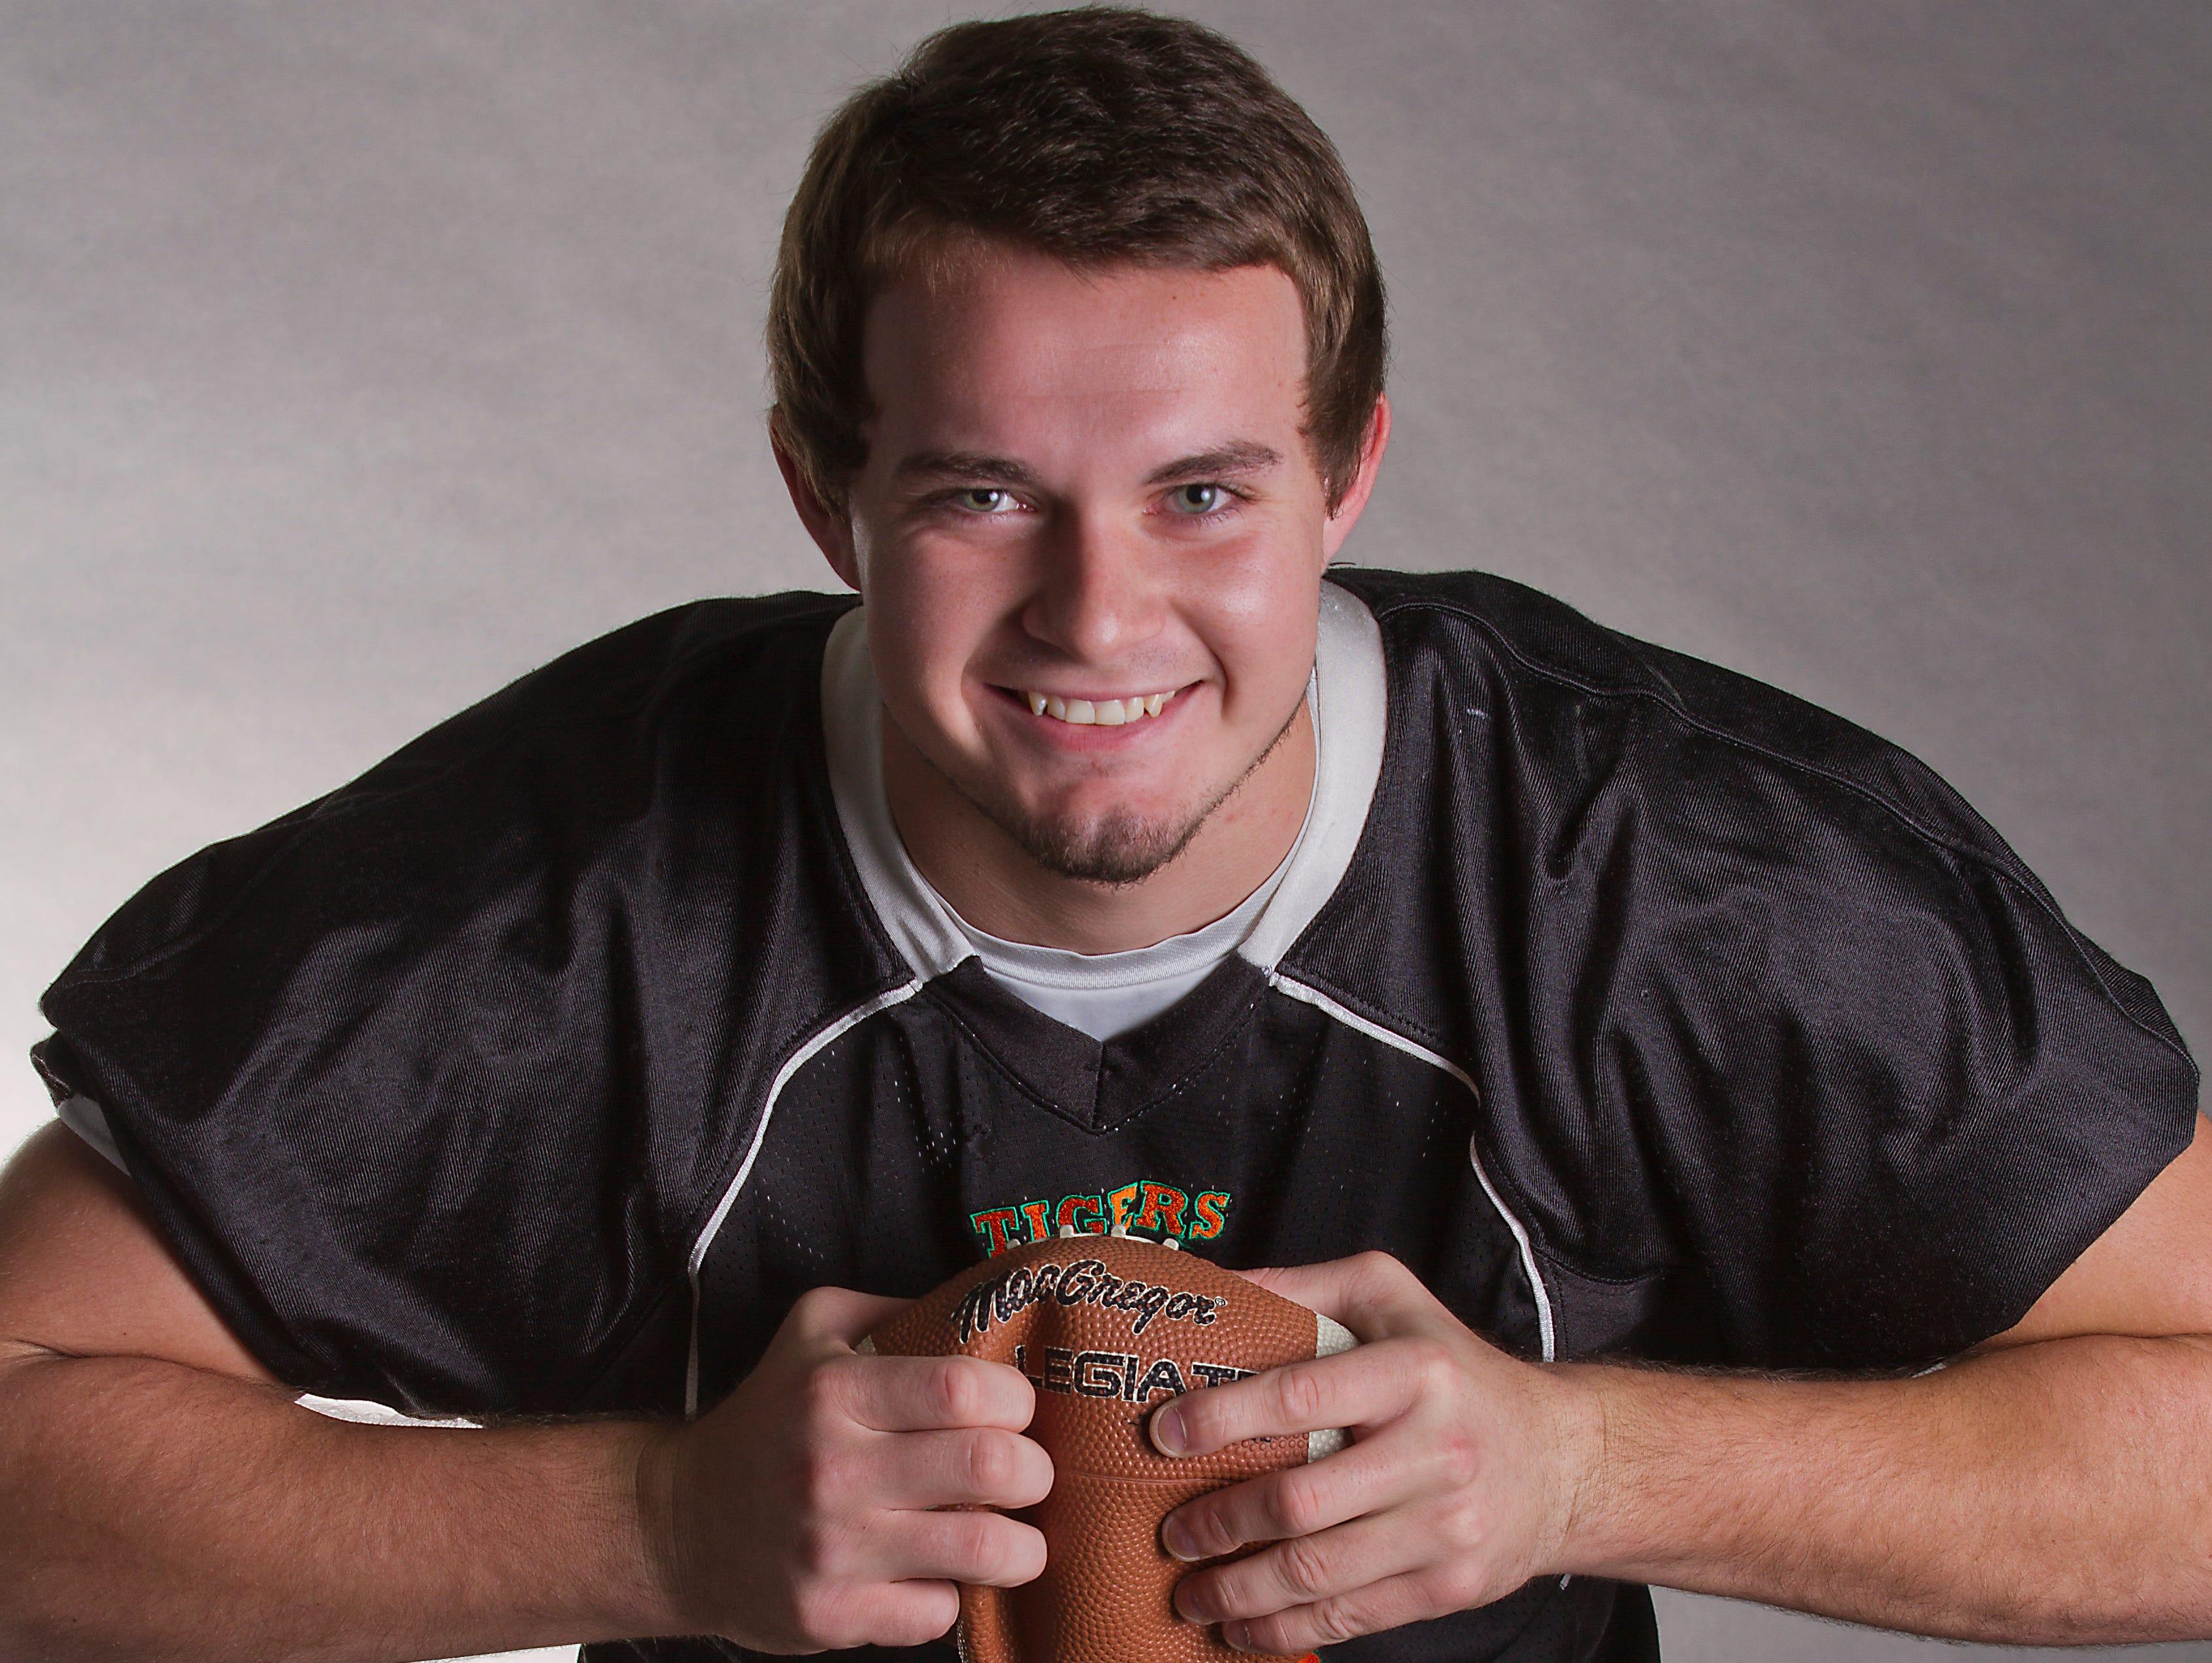 Zach Lackman, 18, Dunbar HS; All Area Football - 2015-2016 school year